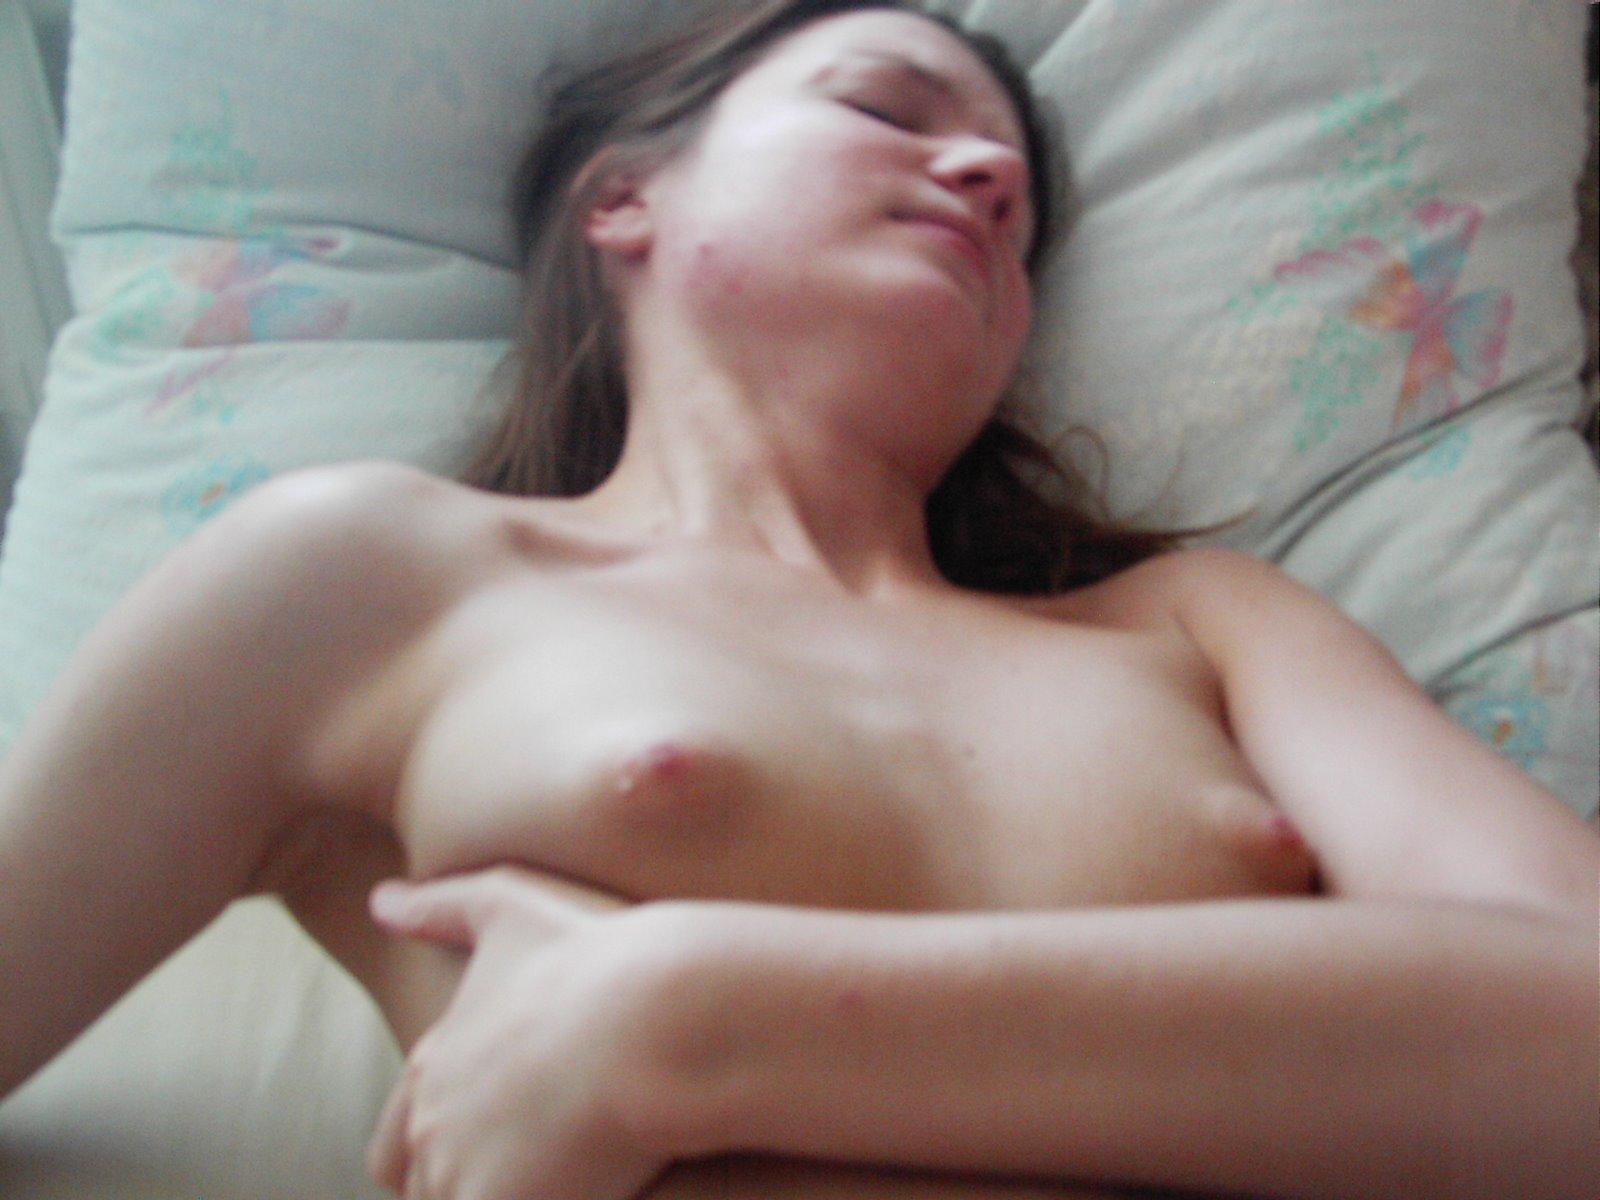 marktplaats seks rotterdam erotic massage